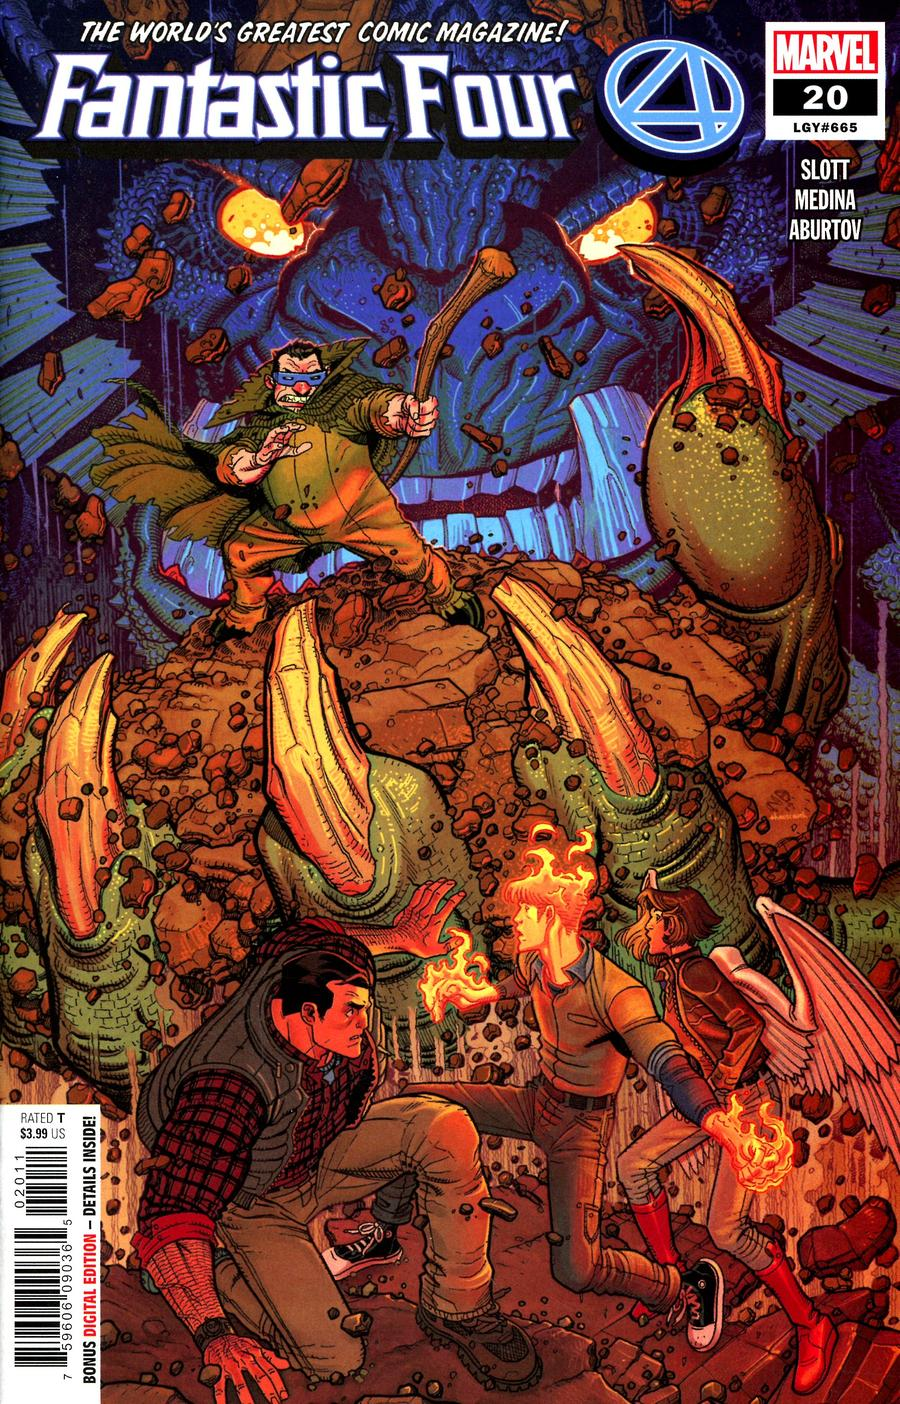 Fantastic Four #20 (2020)